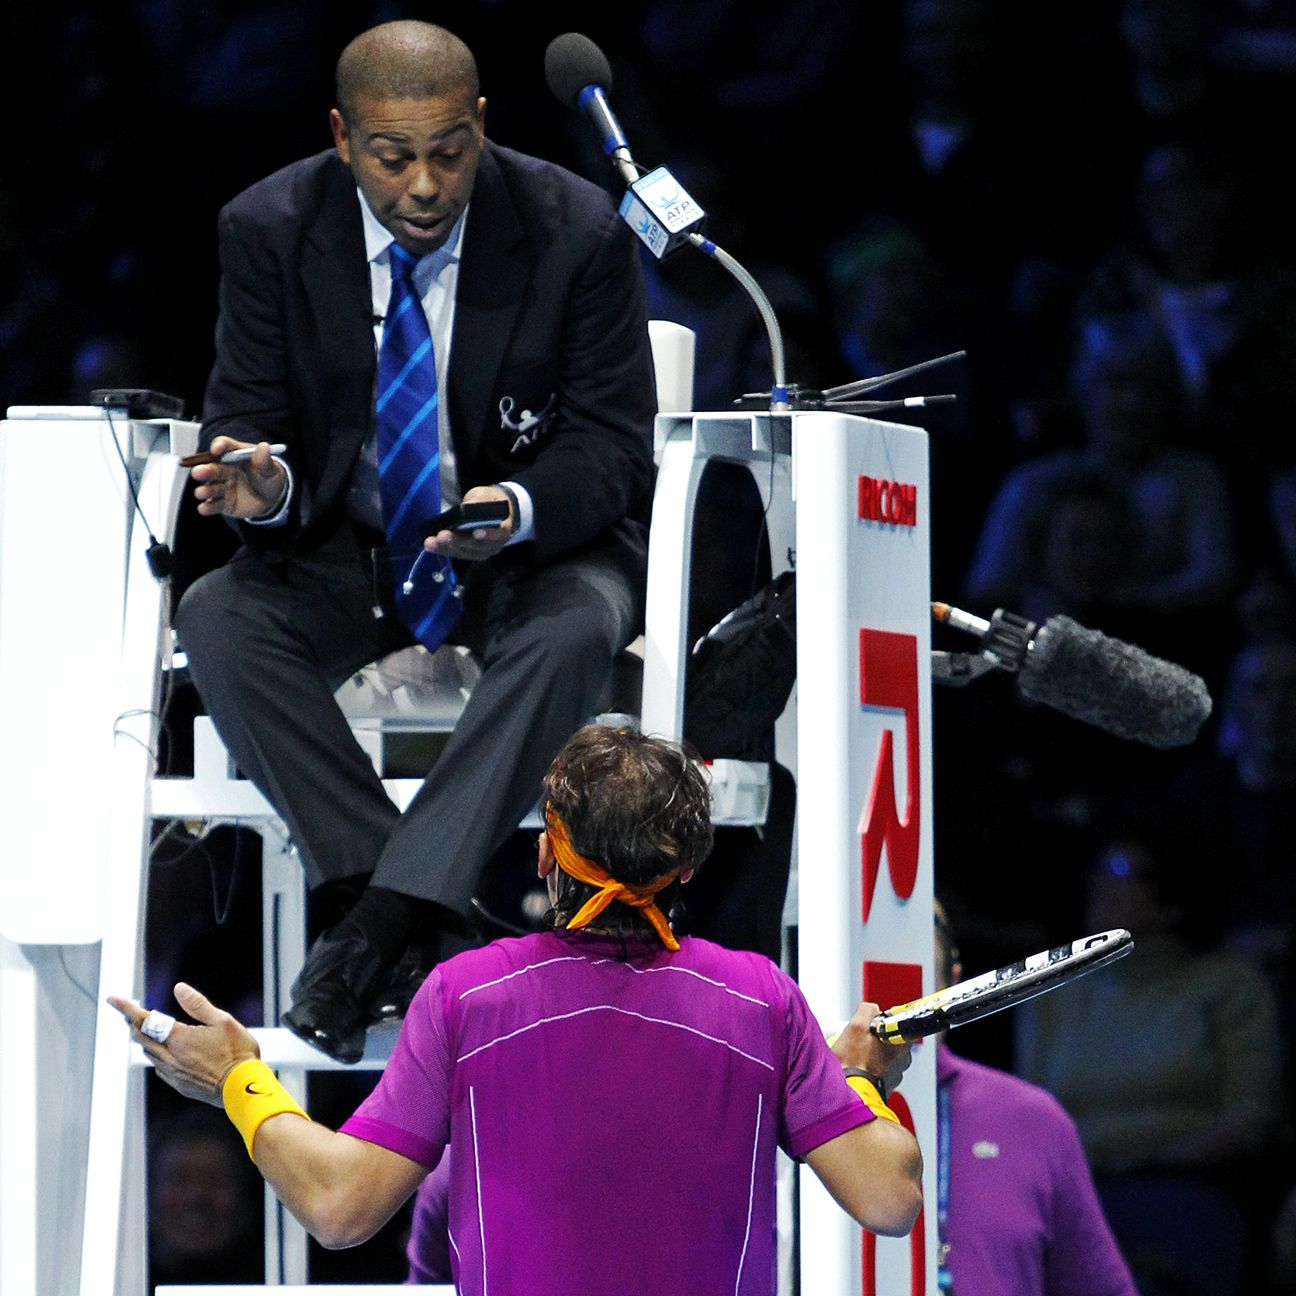 Nascar Racing Games >> Rafael Nadal requests chair umpire Carlos Bernardes not work his matches